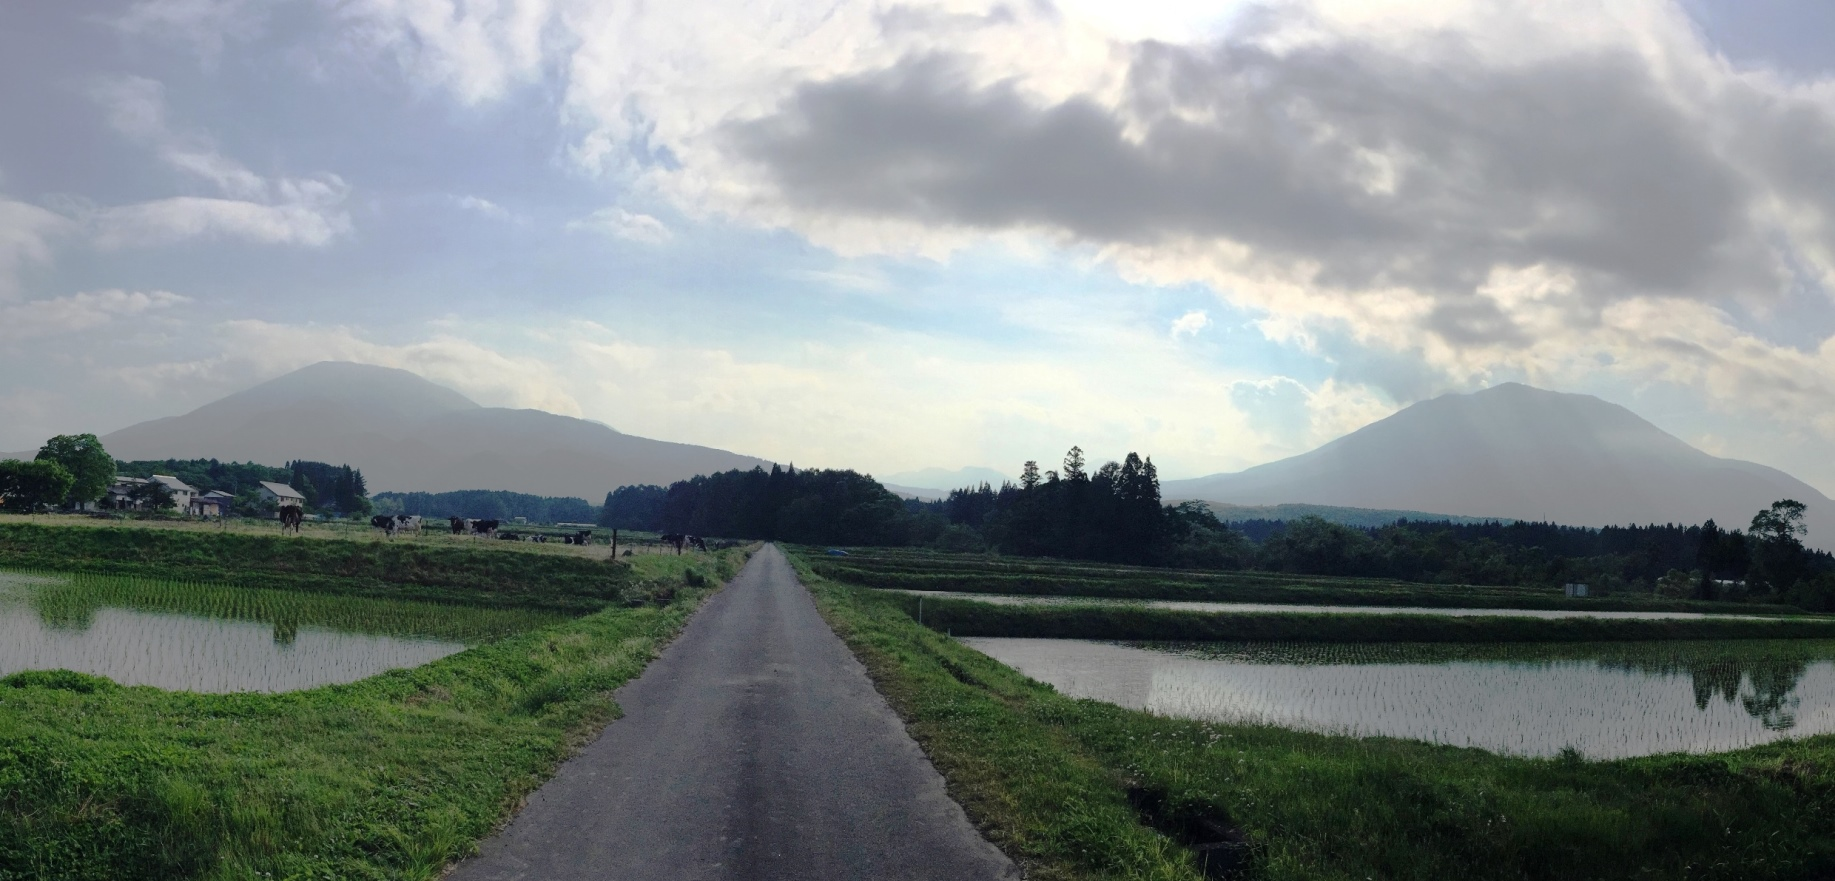 信州・黒姫今日の風景20160527